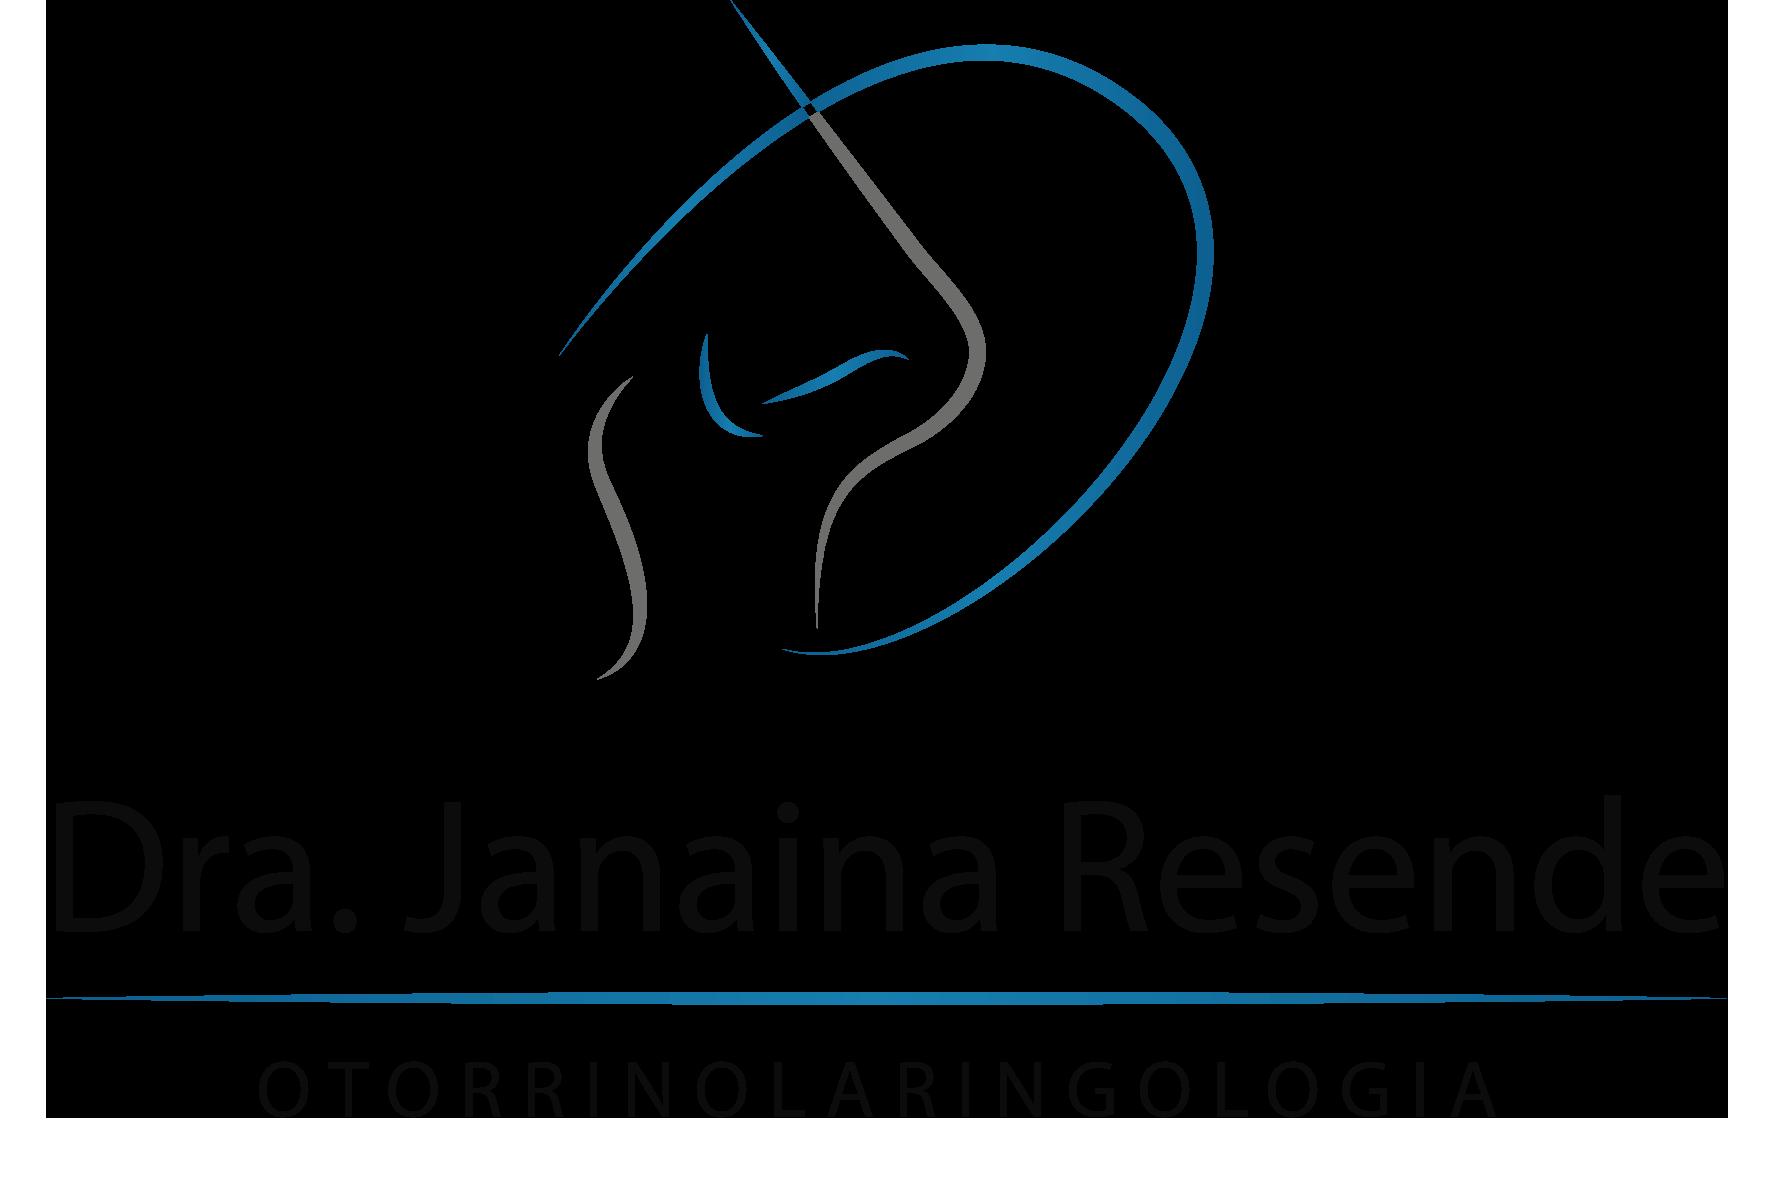 Dra. Janaina Resende